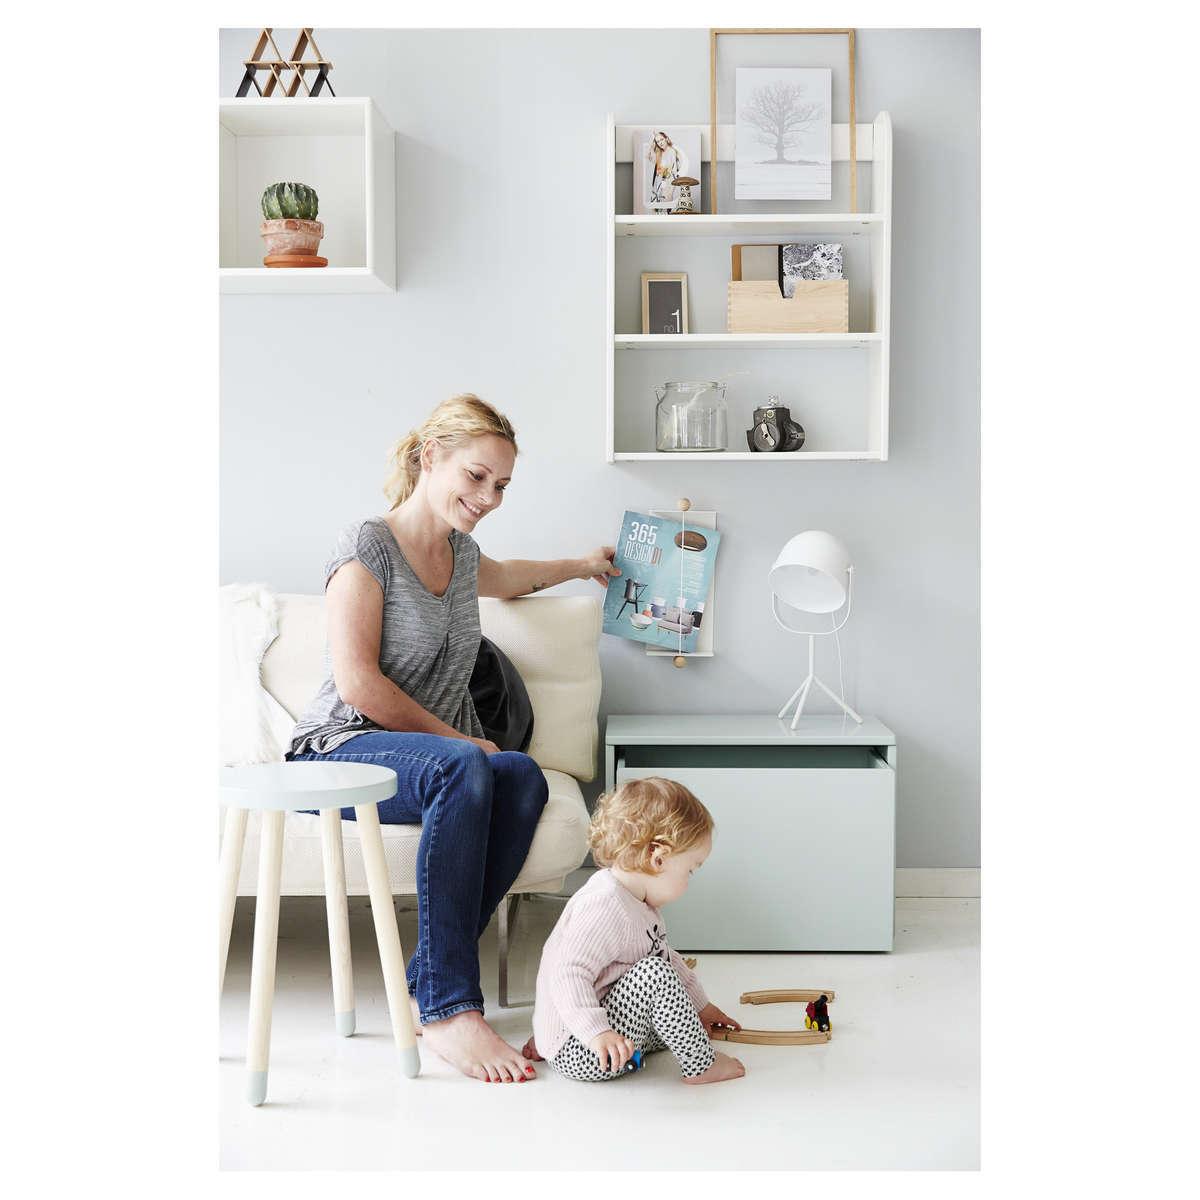 flexa etag re play blanc tag re flexa sur l 39 armoire. Black Bedroom Furniture Sets. Home Design Ideas